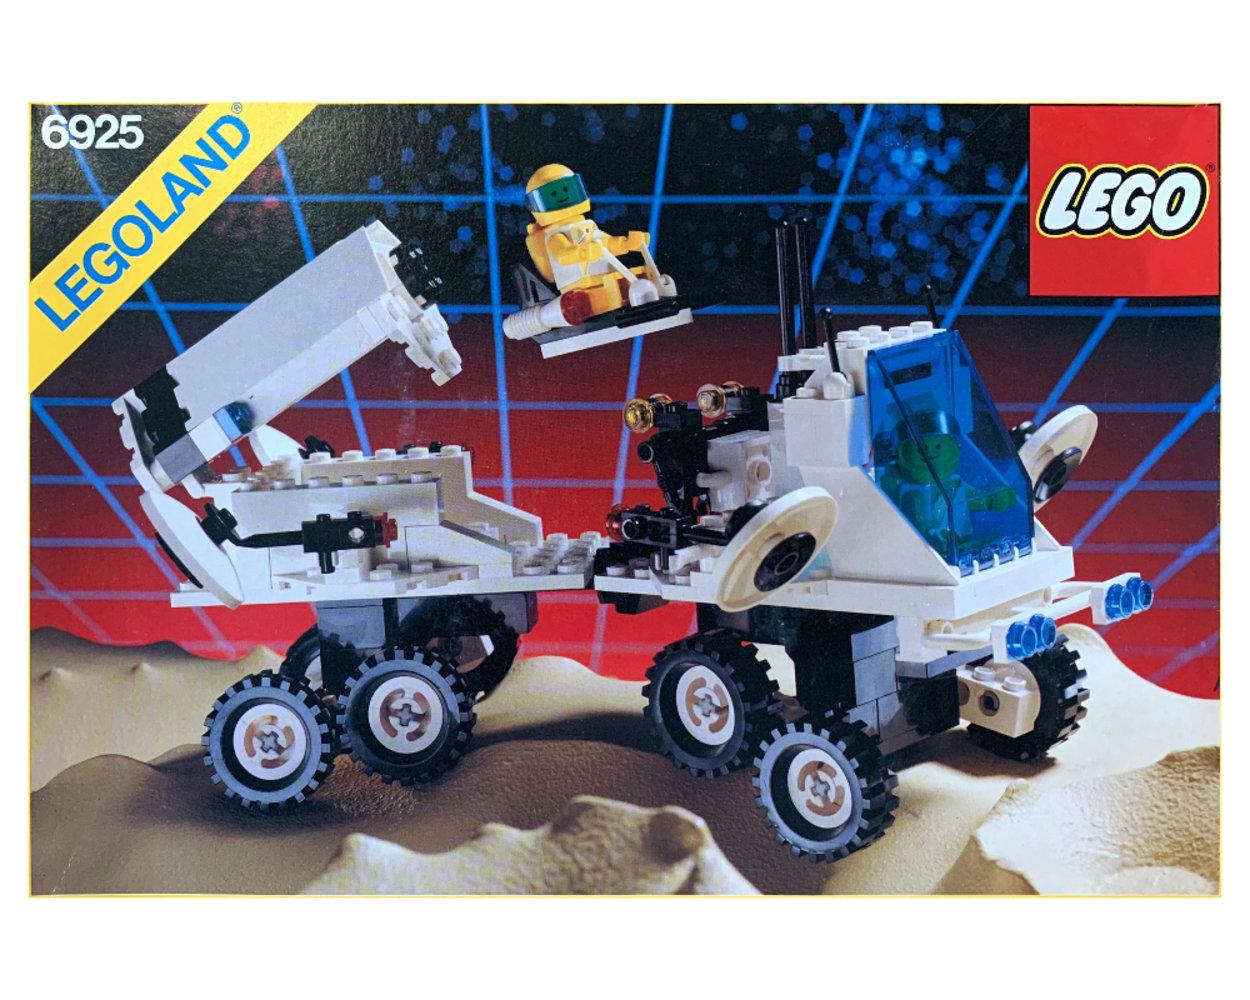 Interplanetary Rover